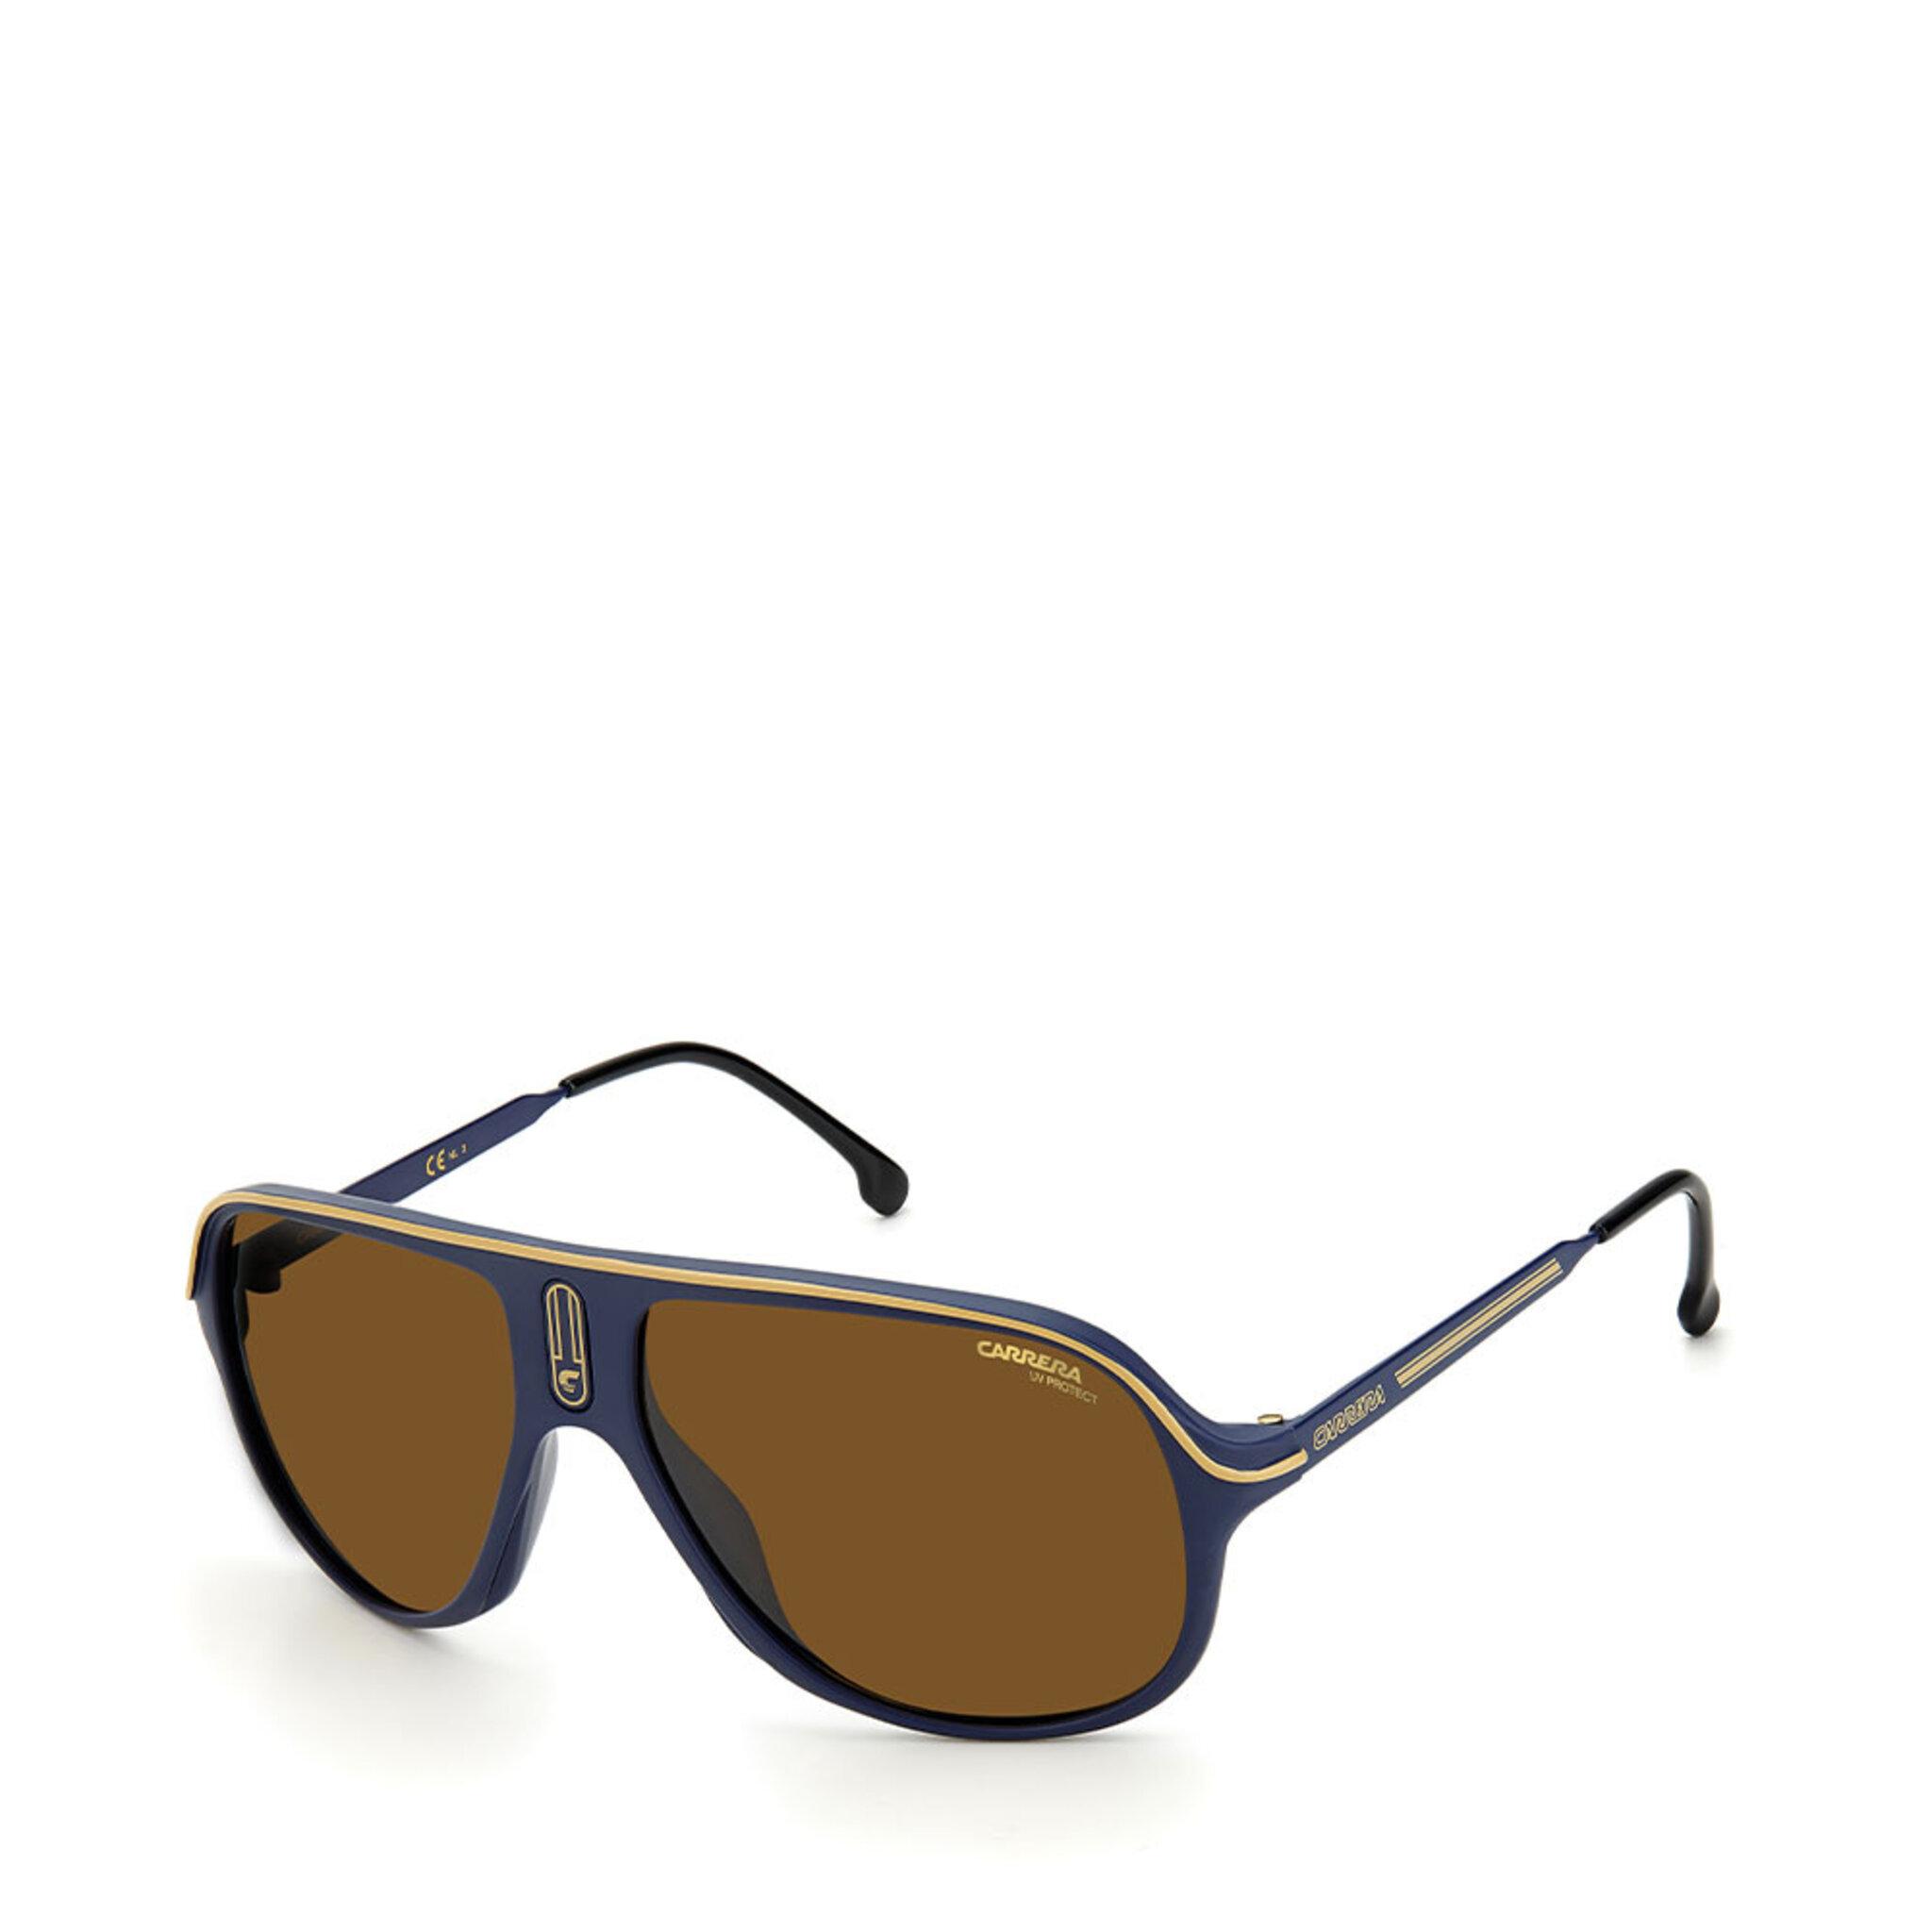 CARRERA Sunglasses SAFARI65